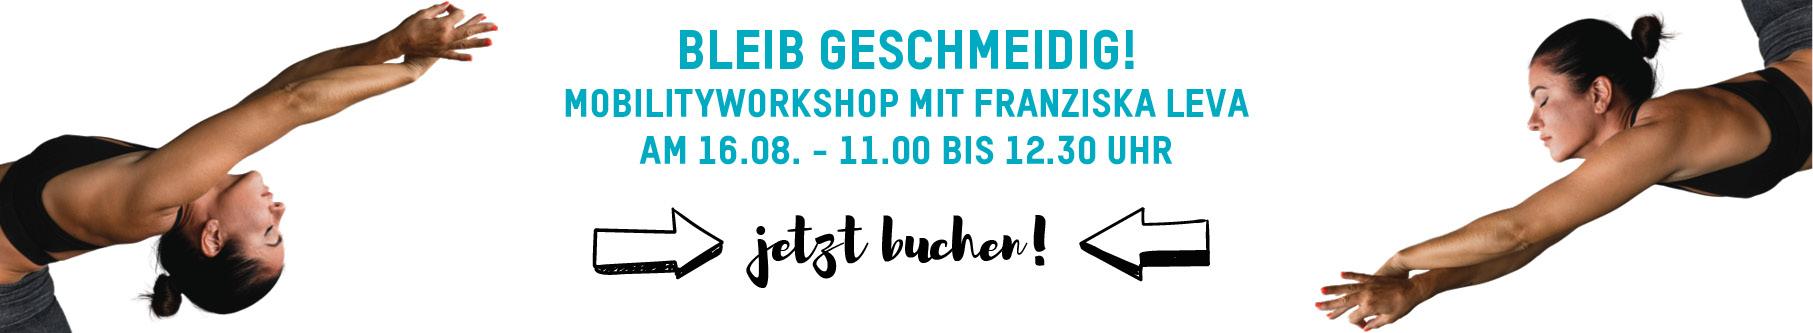 Mobility Workshop mit Personal Trainer Franziska Leva